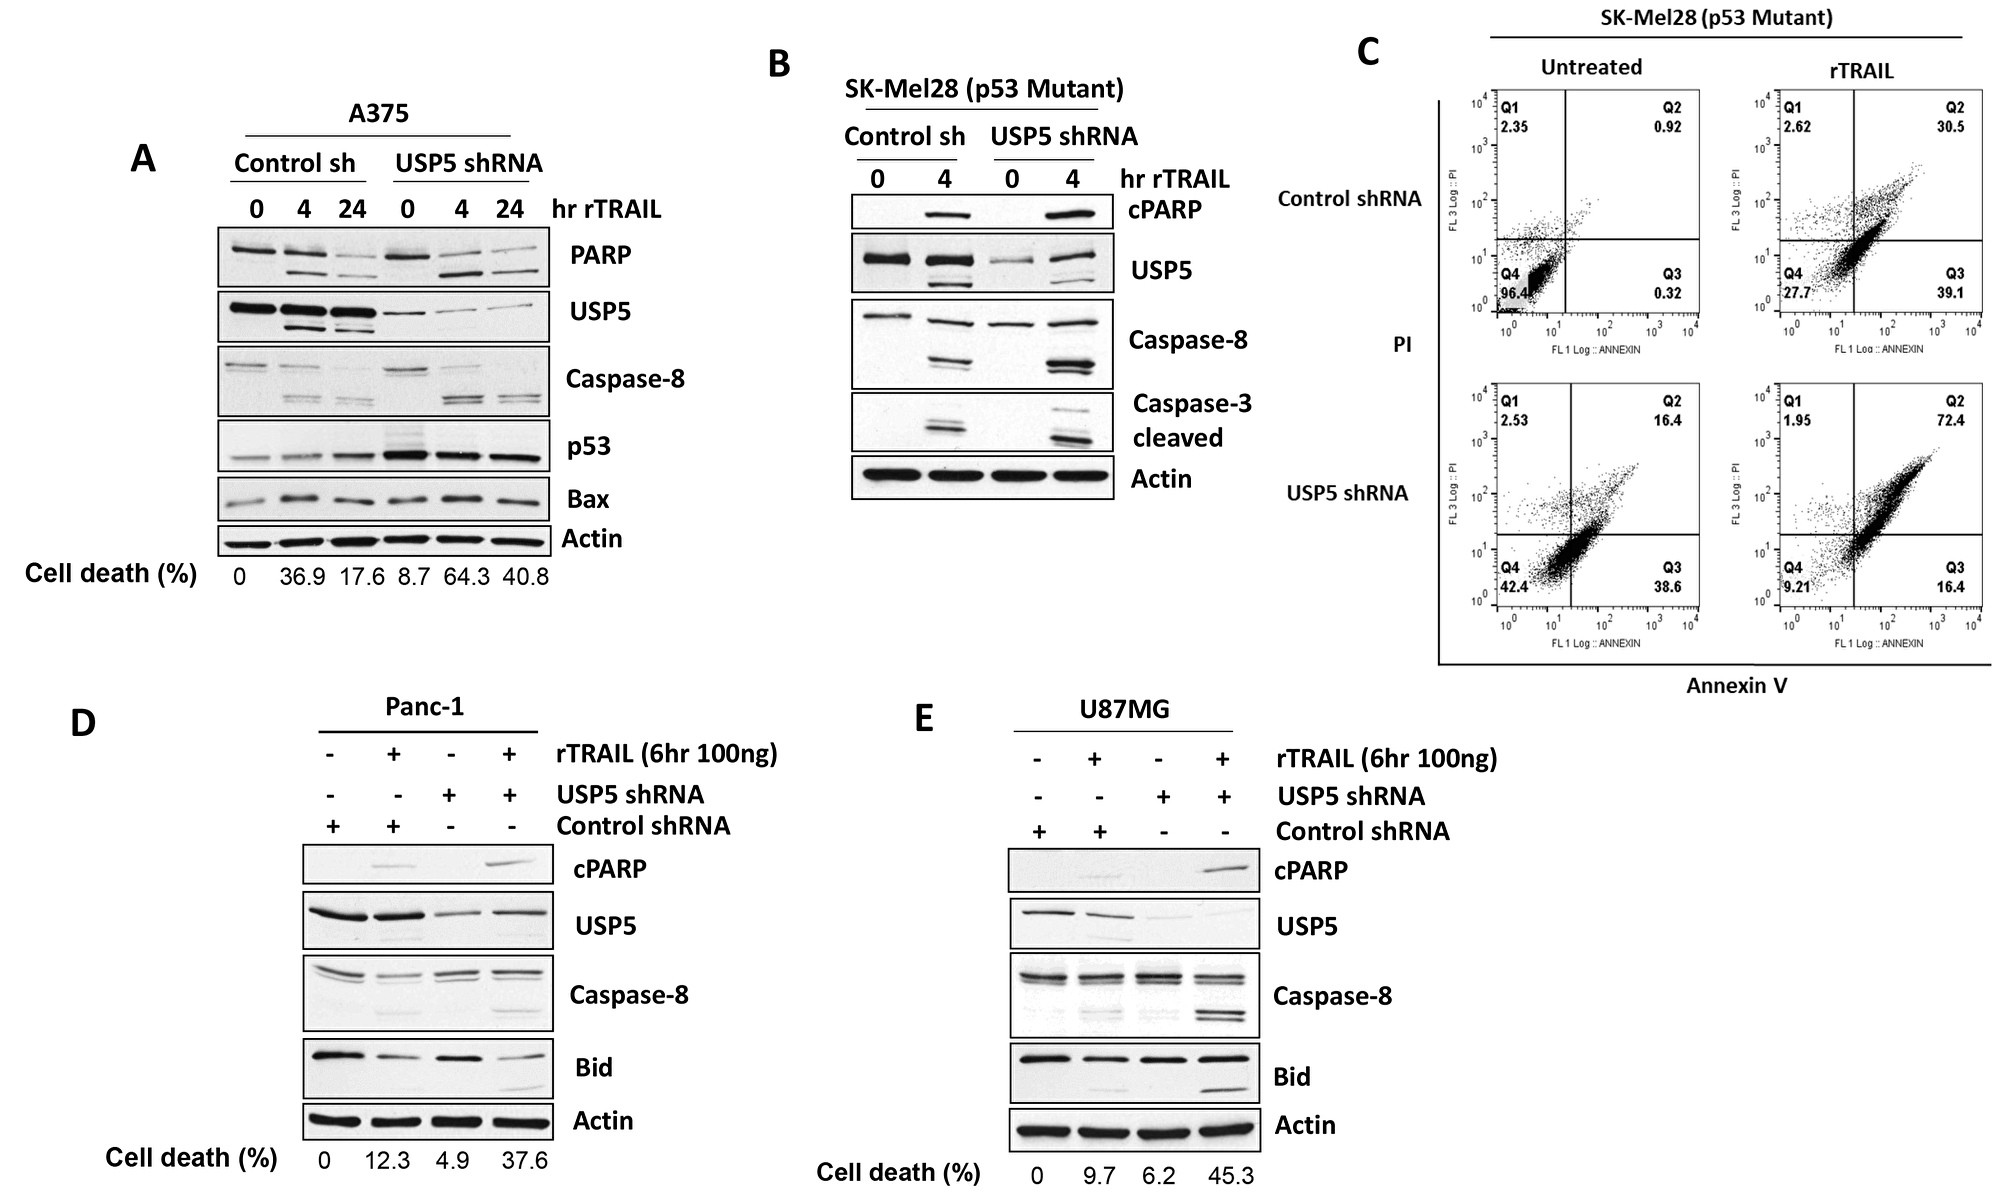 USP5 regulates apoptotic responsiveness to TRAIL.